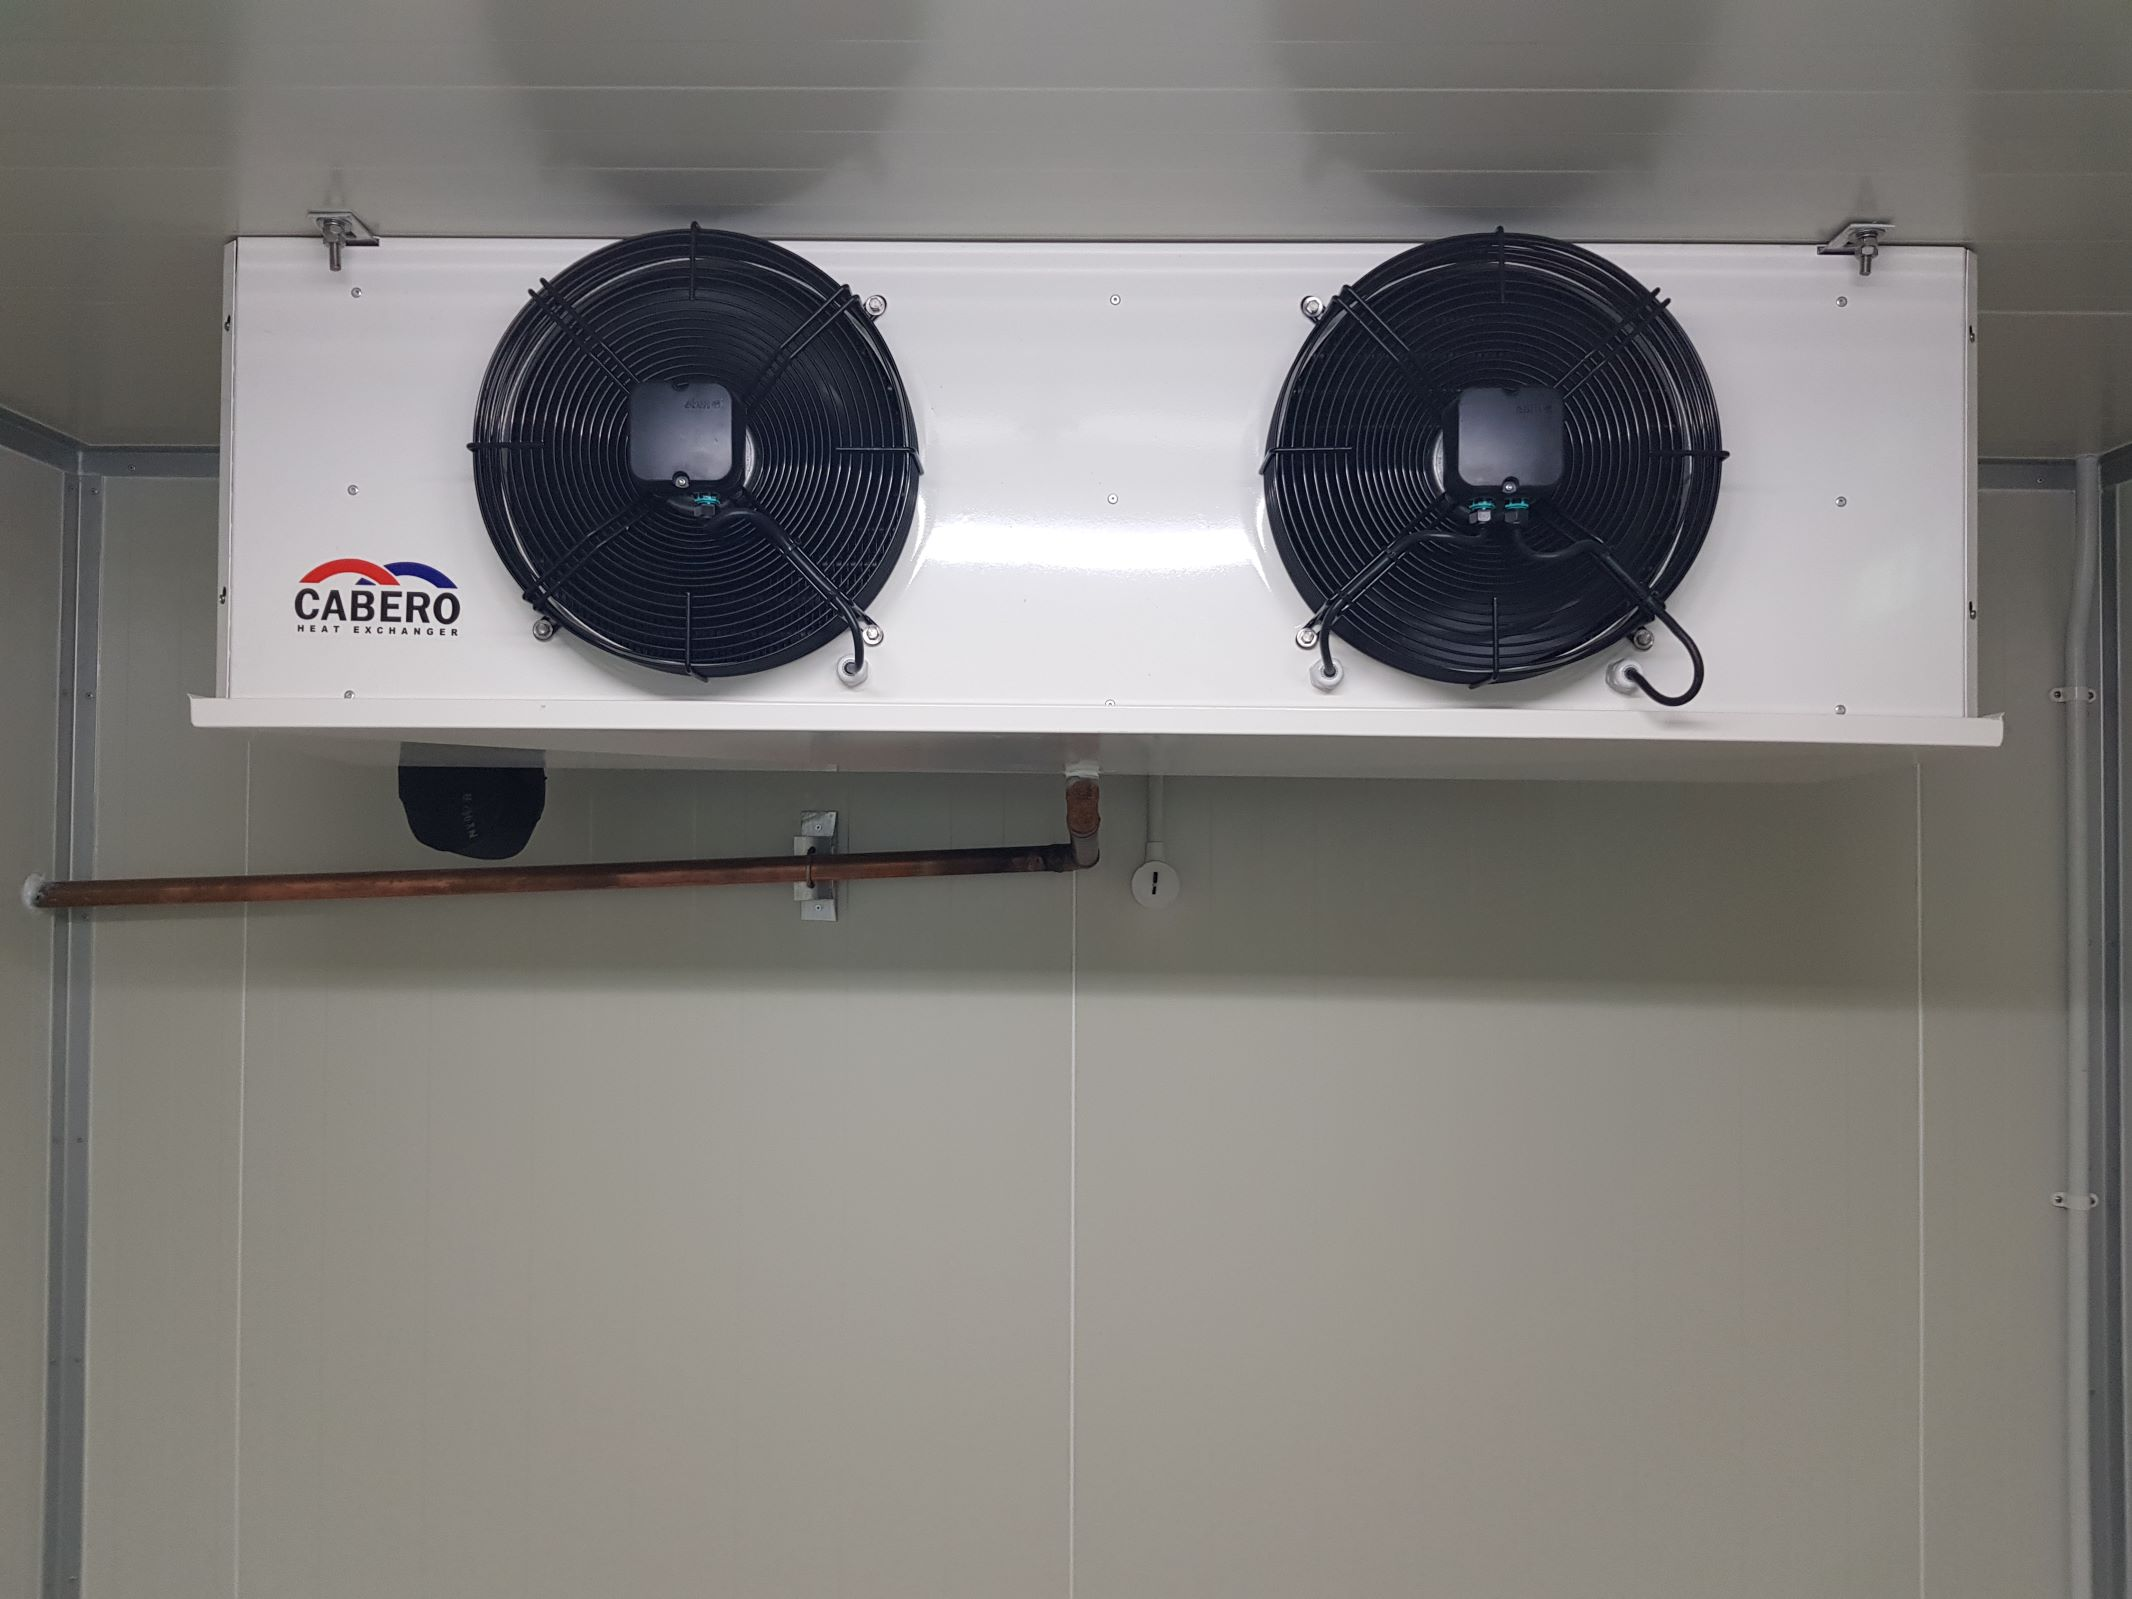 Freezer Unit Cooler